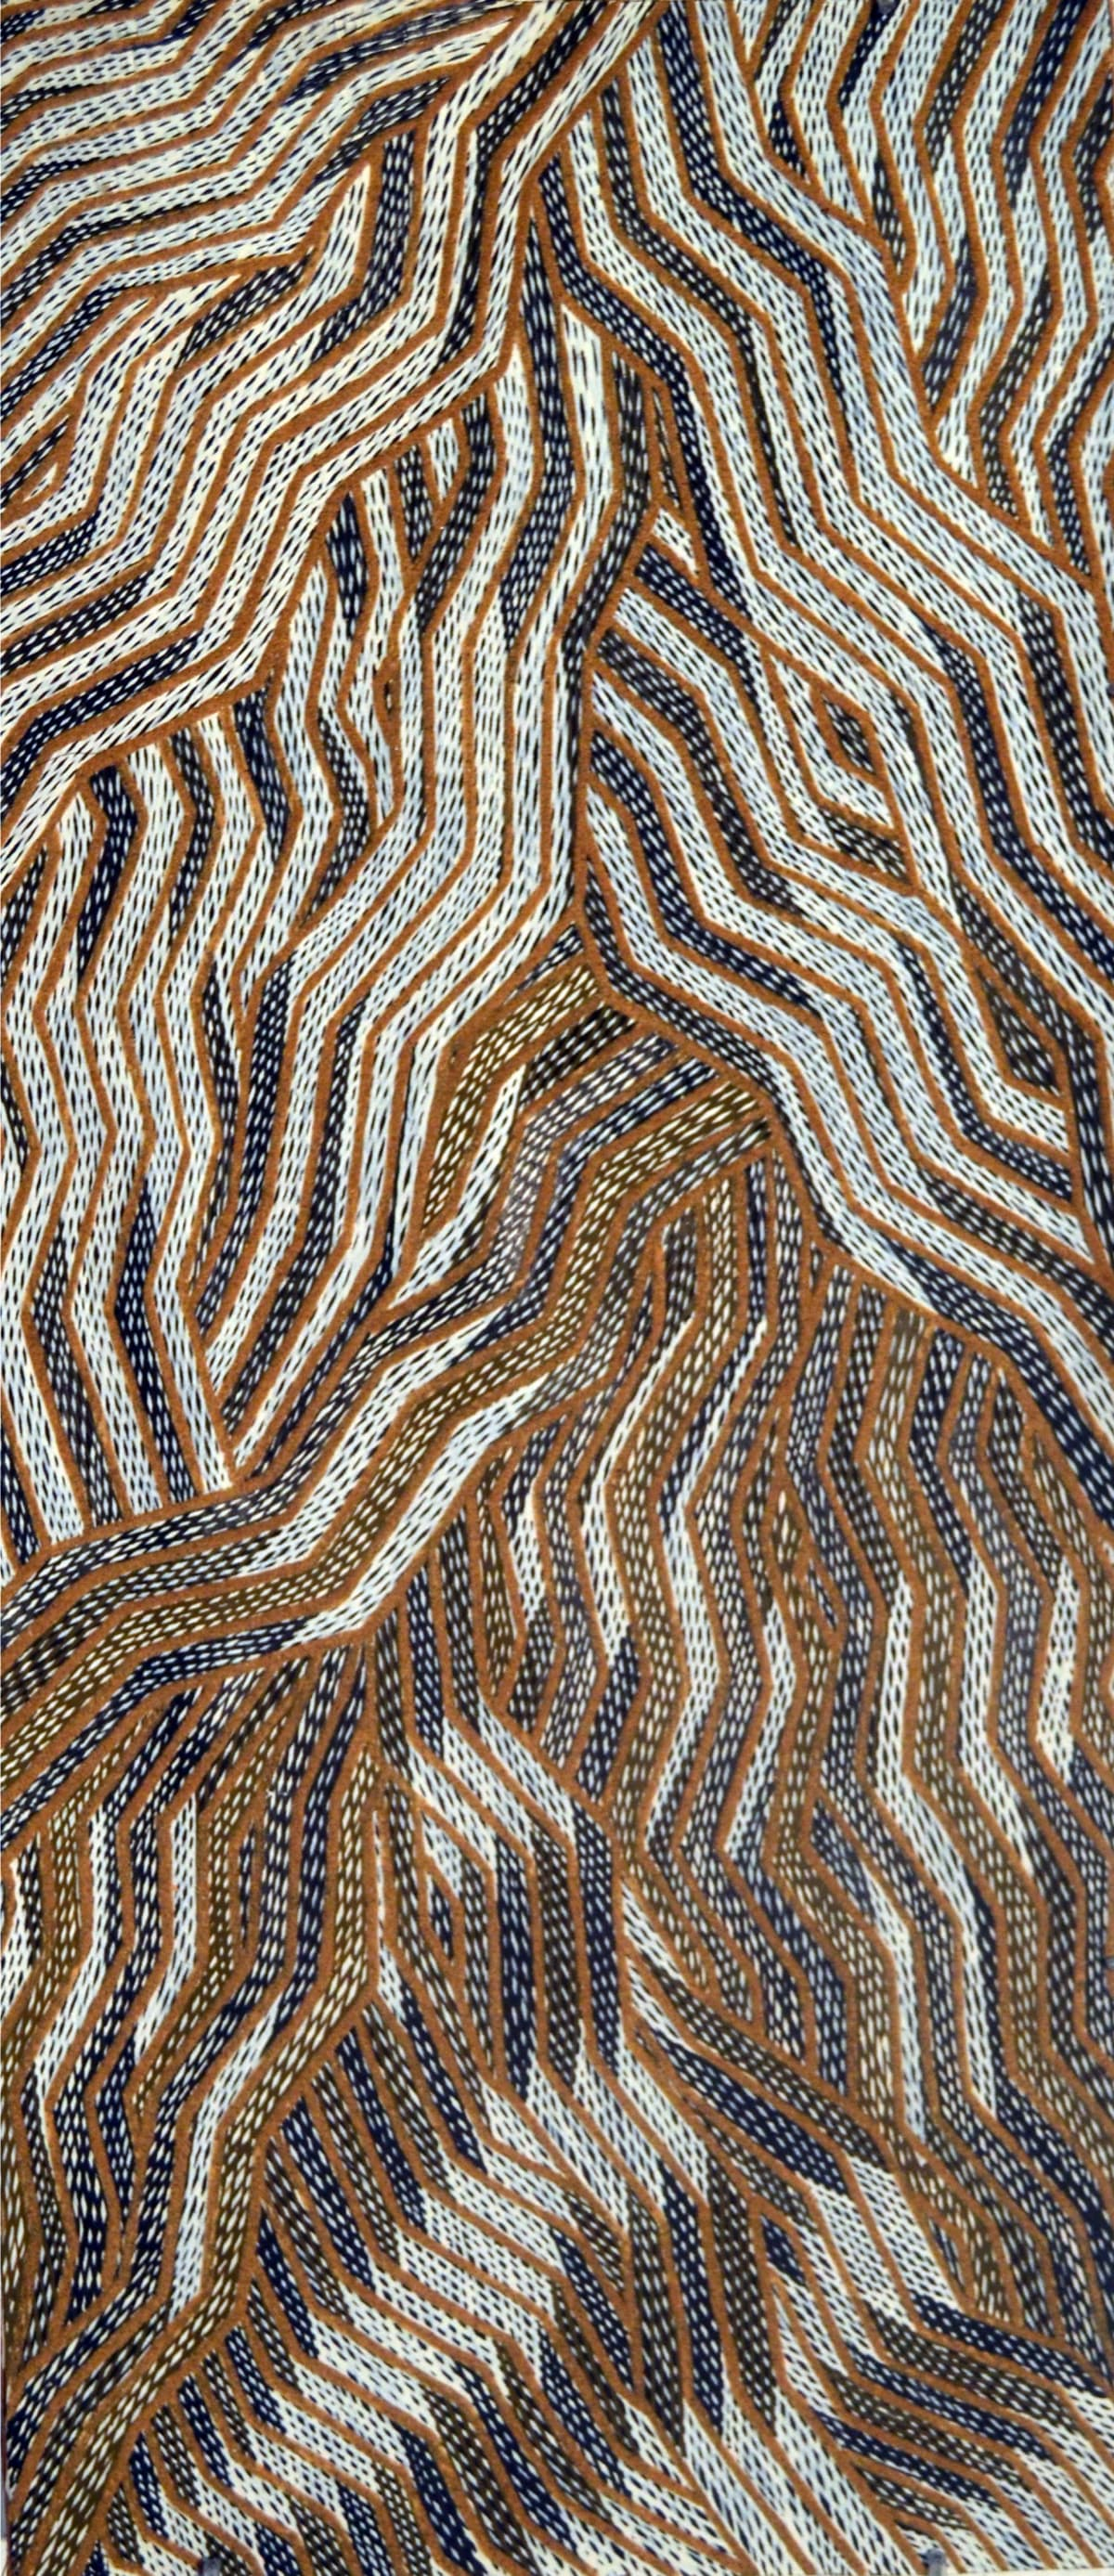 Lamangirra #2 Gumana Garraparra natural earth pigment on bark 92 x 38 cm